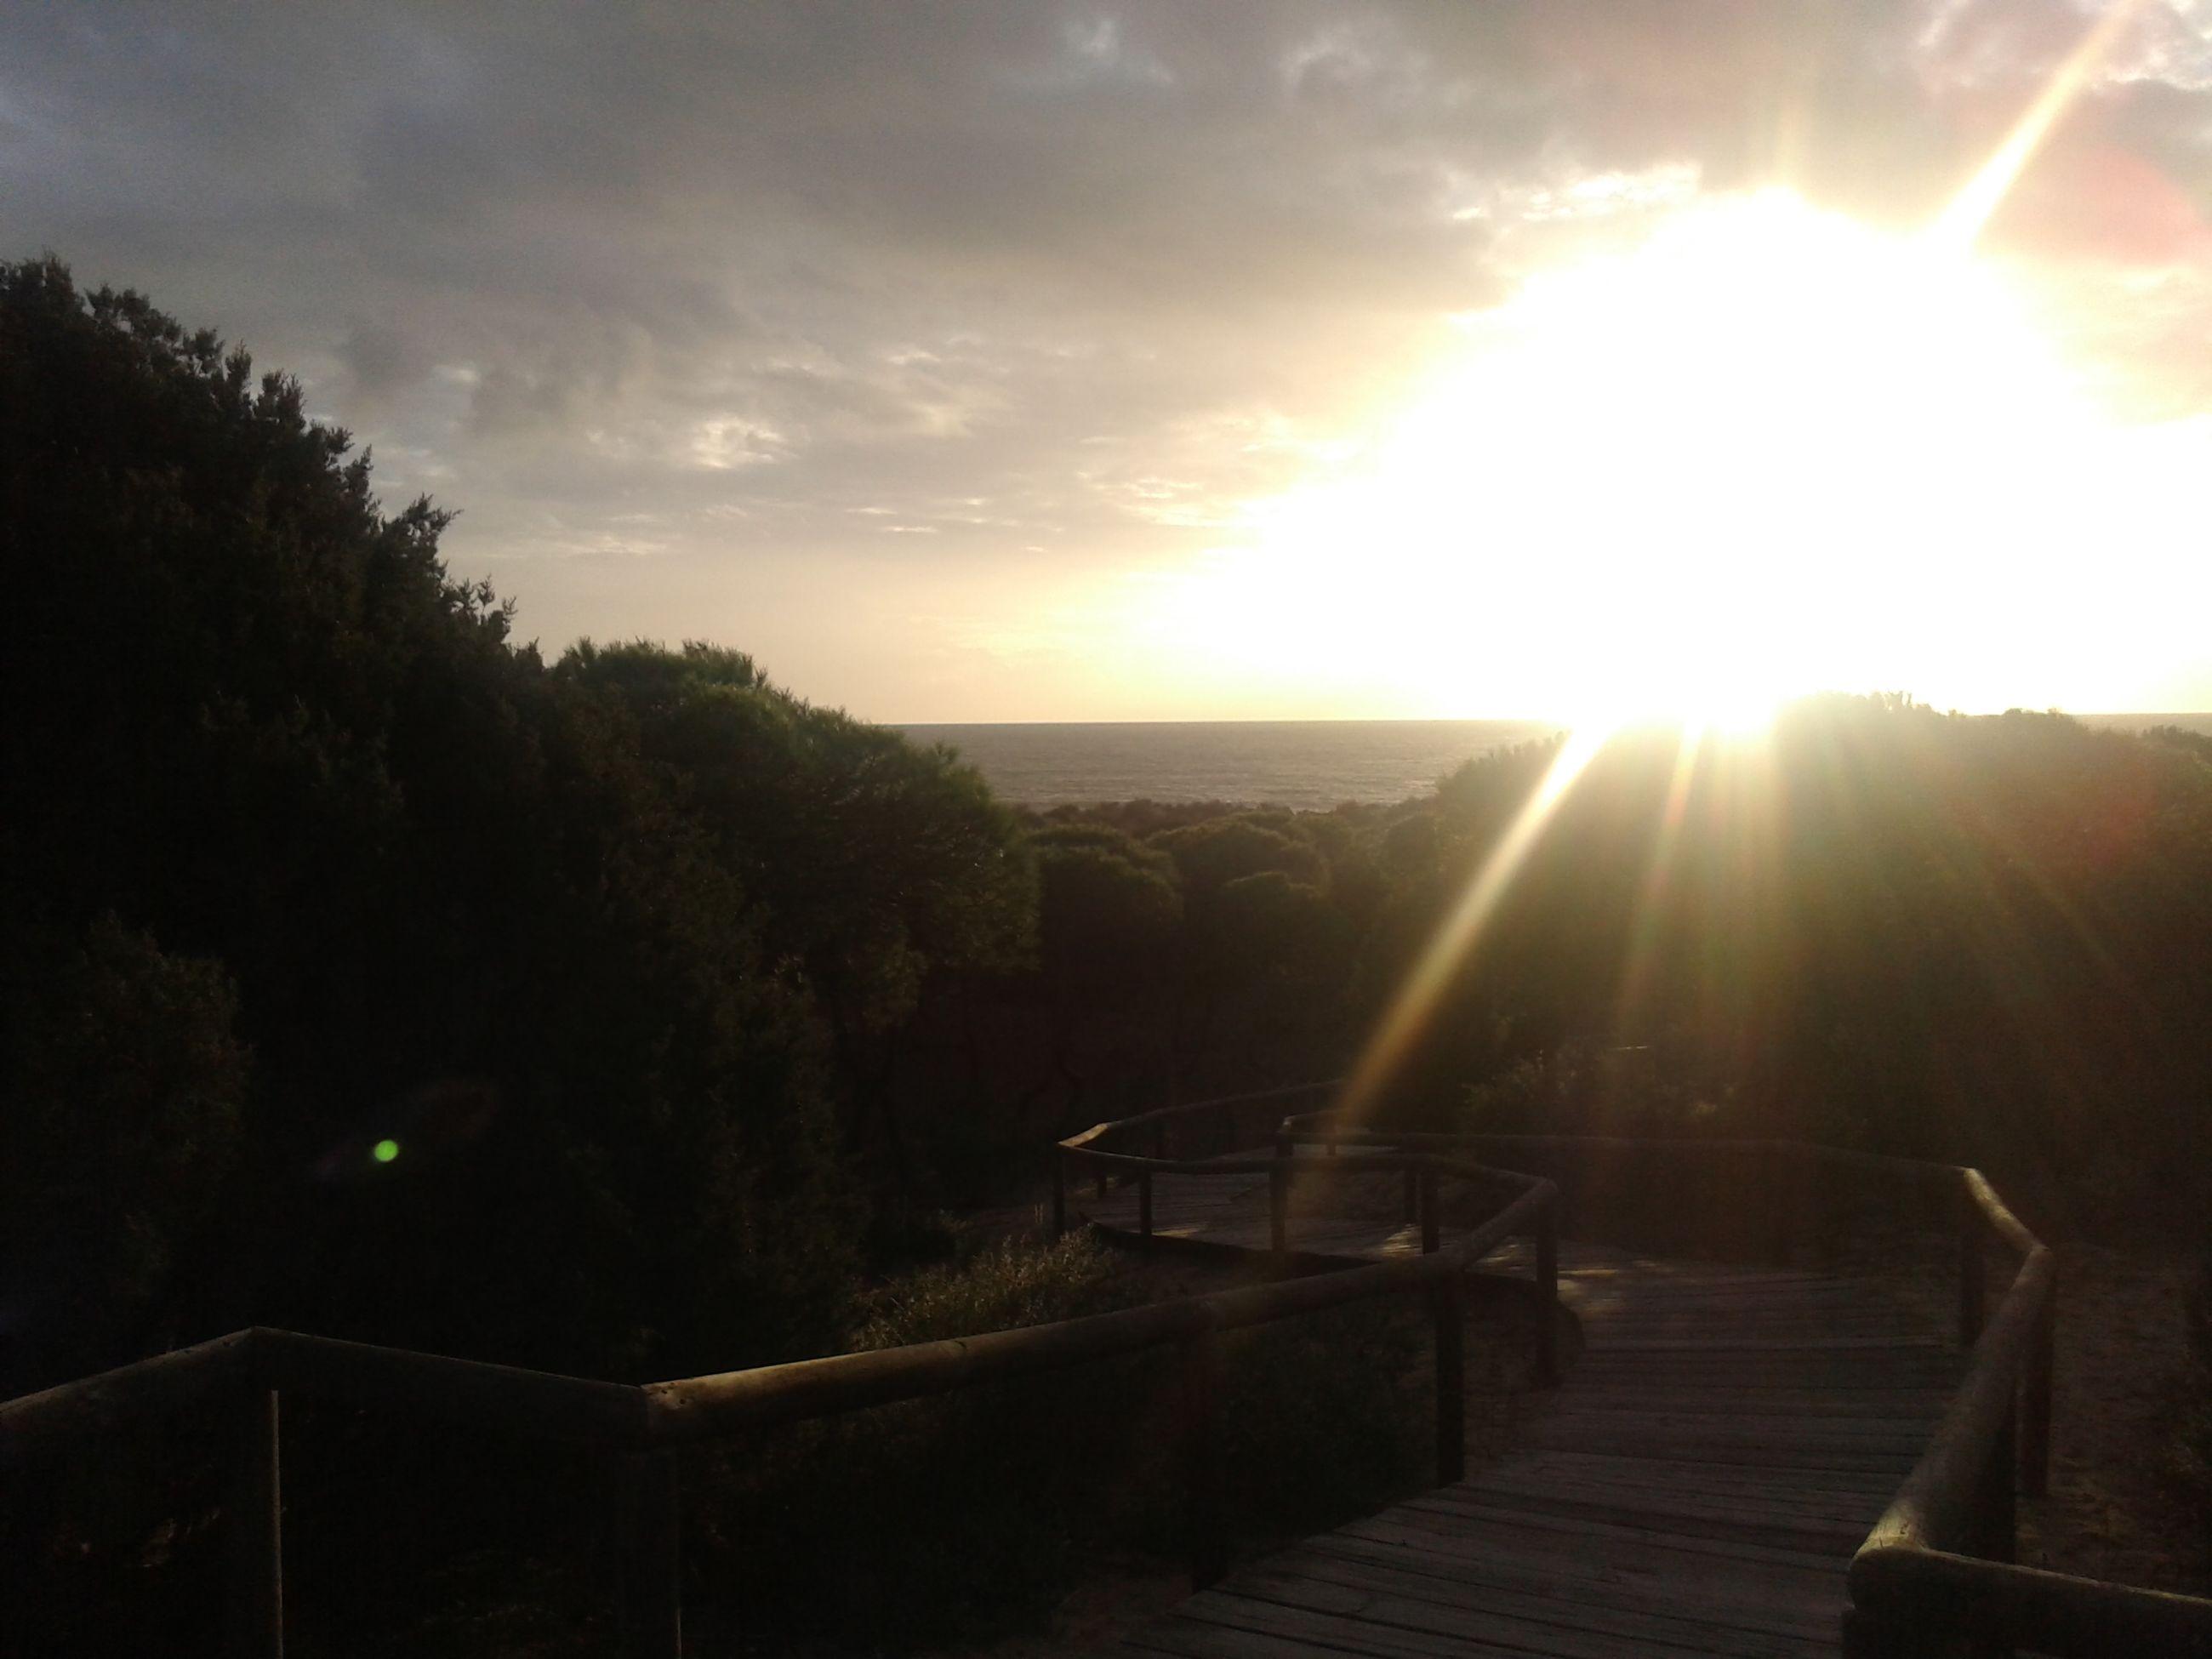 sun, sunbeam, sunlight, sunset, lens flare, sky, scenics, tranquil scene, beauty in nature, tranquility, sea, nature, water, horizon over water, idyllic, cloud - sky, railing, sunny, tree, bright